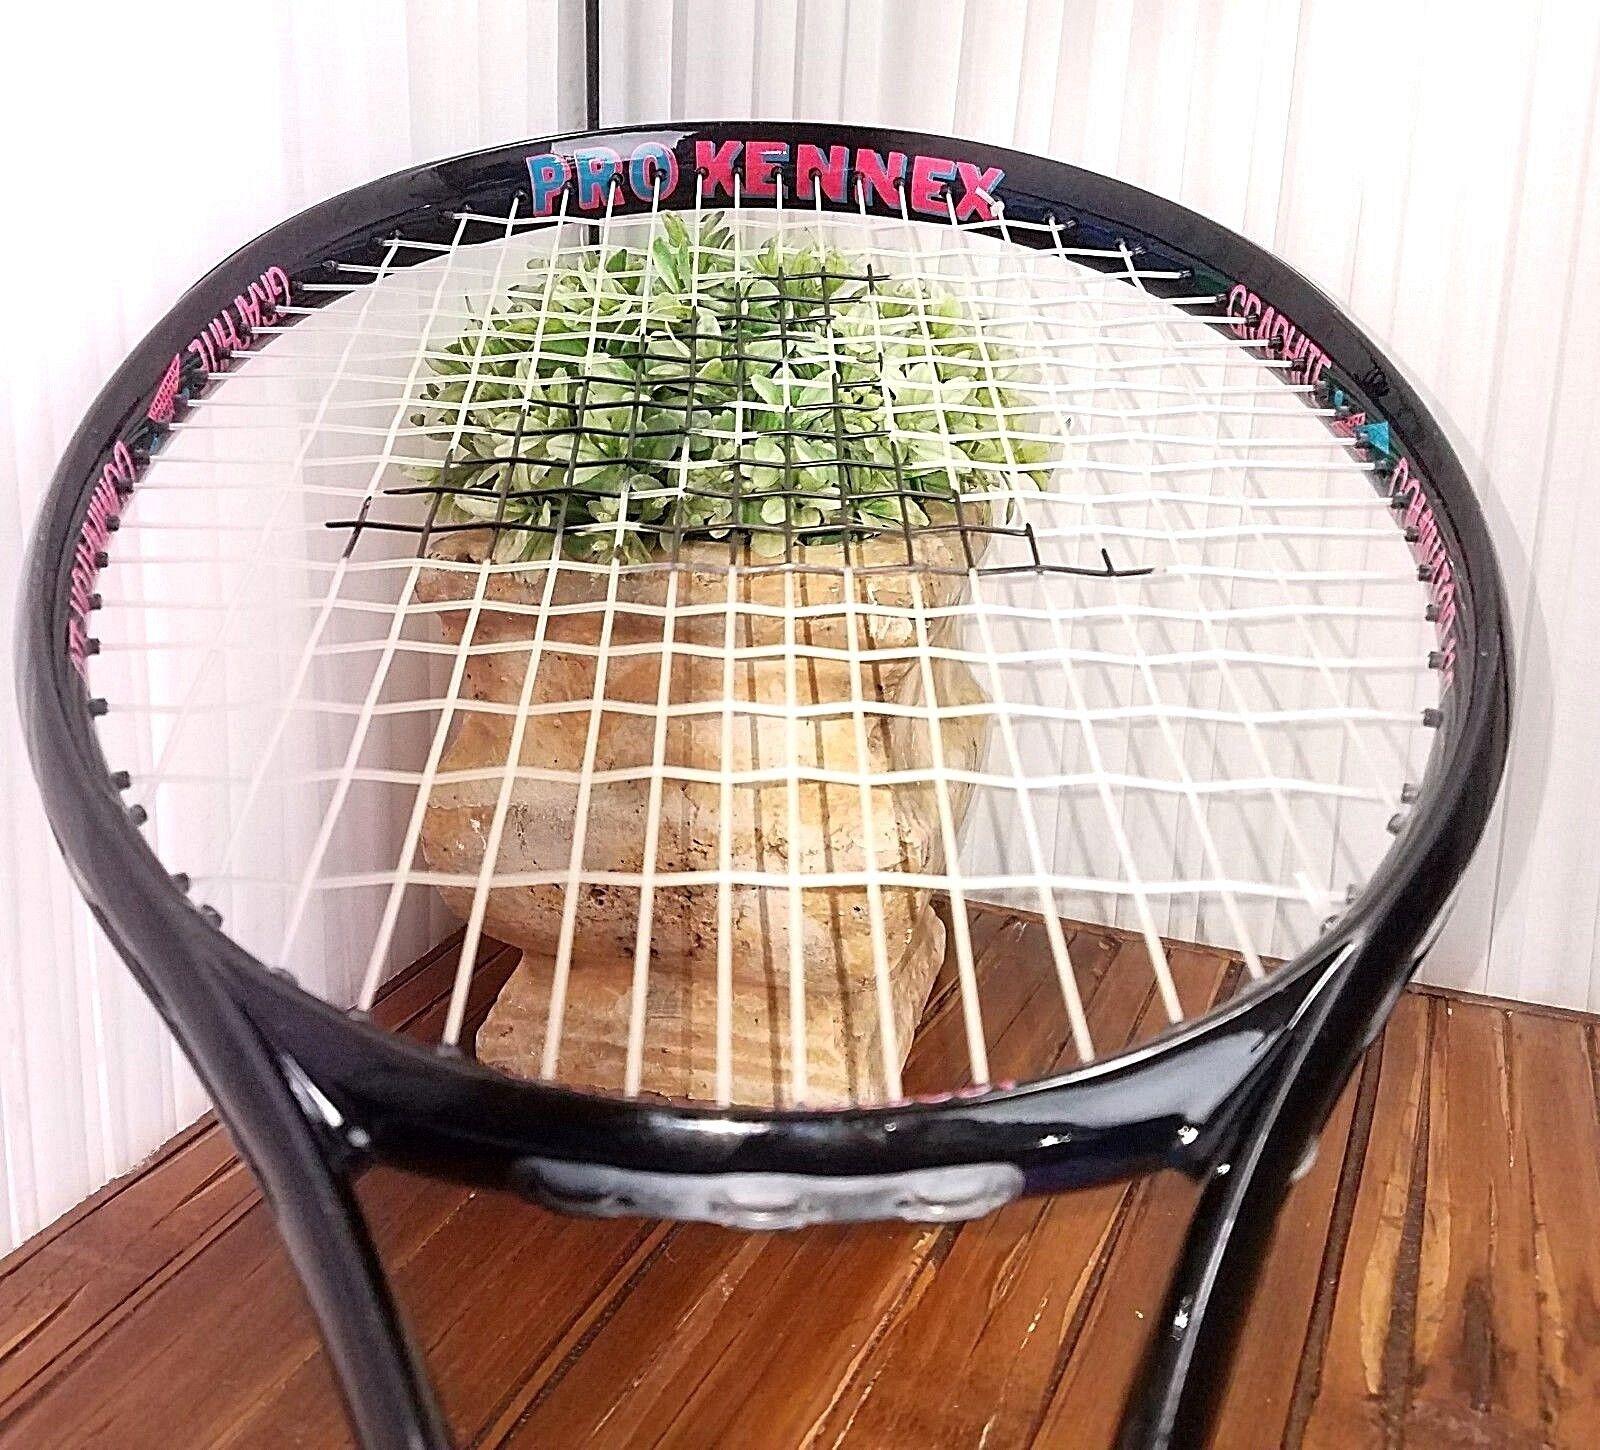 Pro Kennex tenis raqueta de gran tamaño Widebody 4 1 2